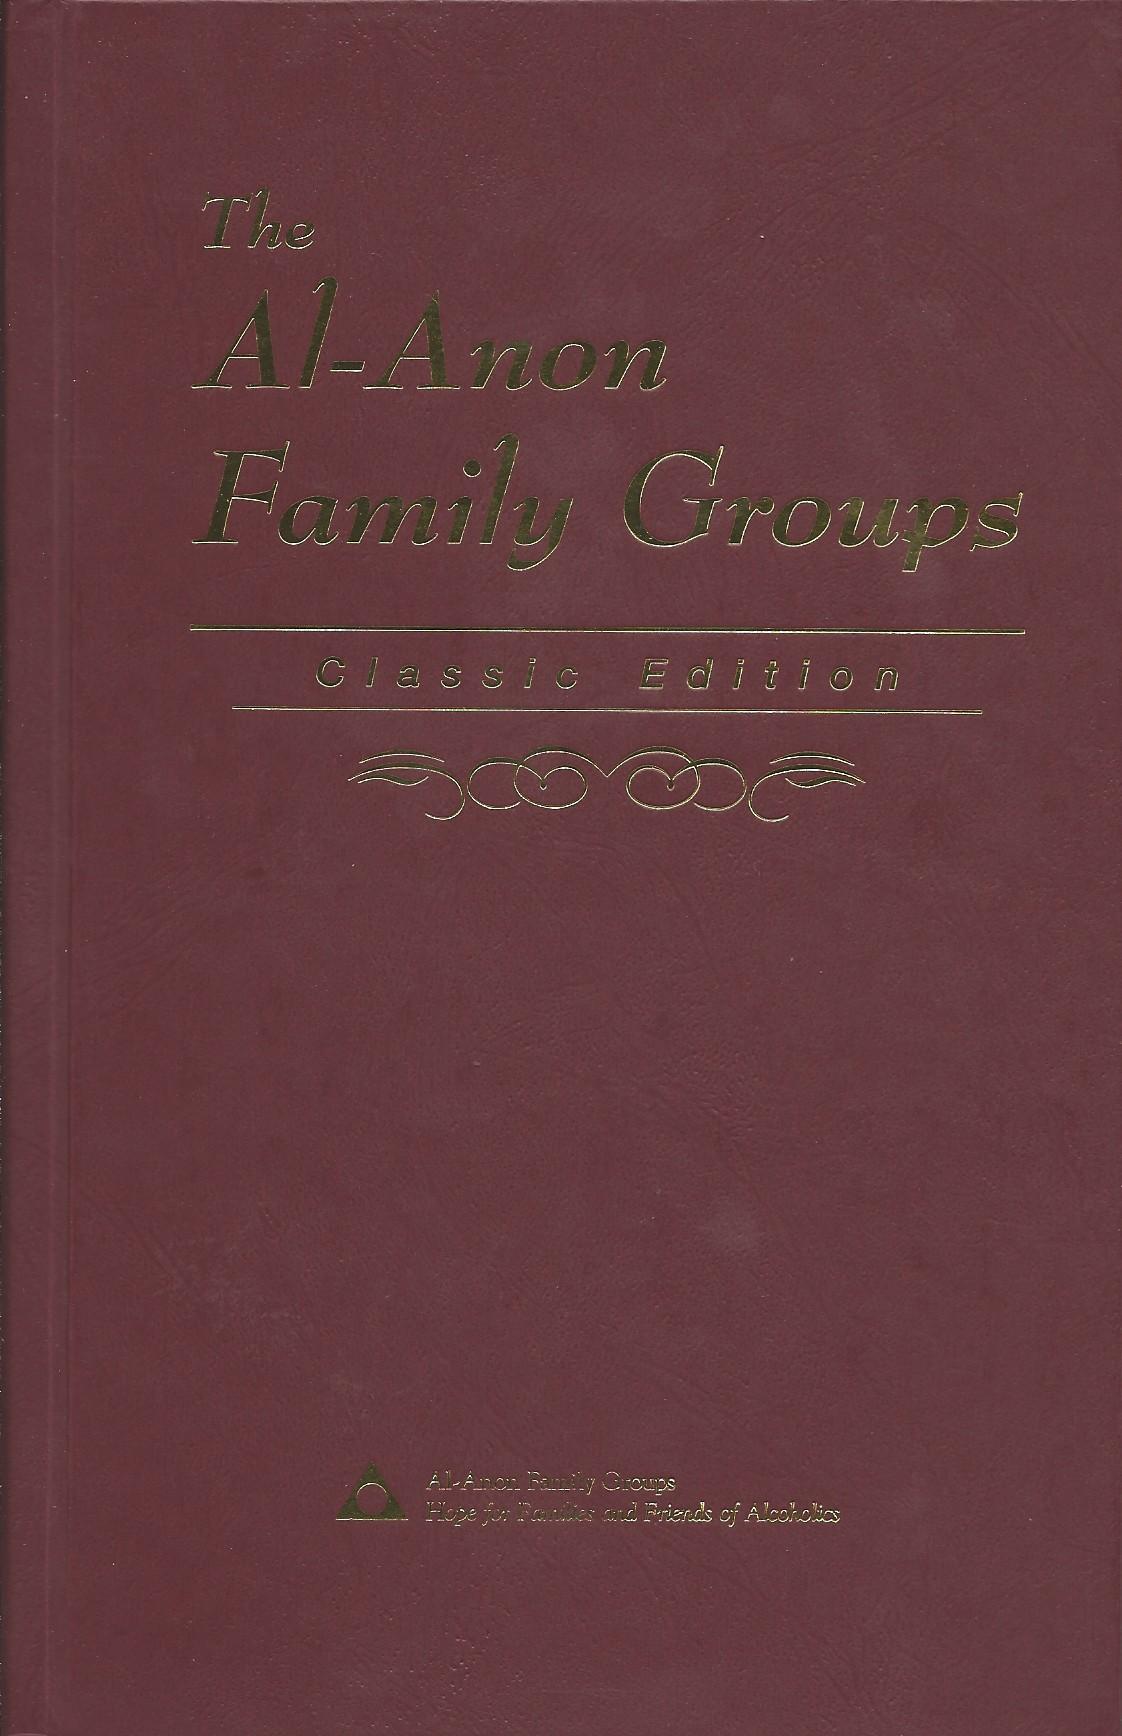 Al Anon Family Groups